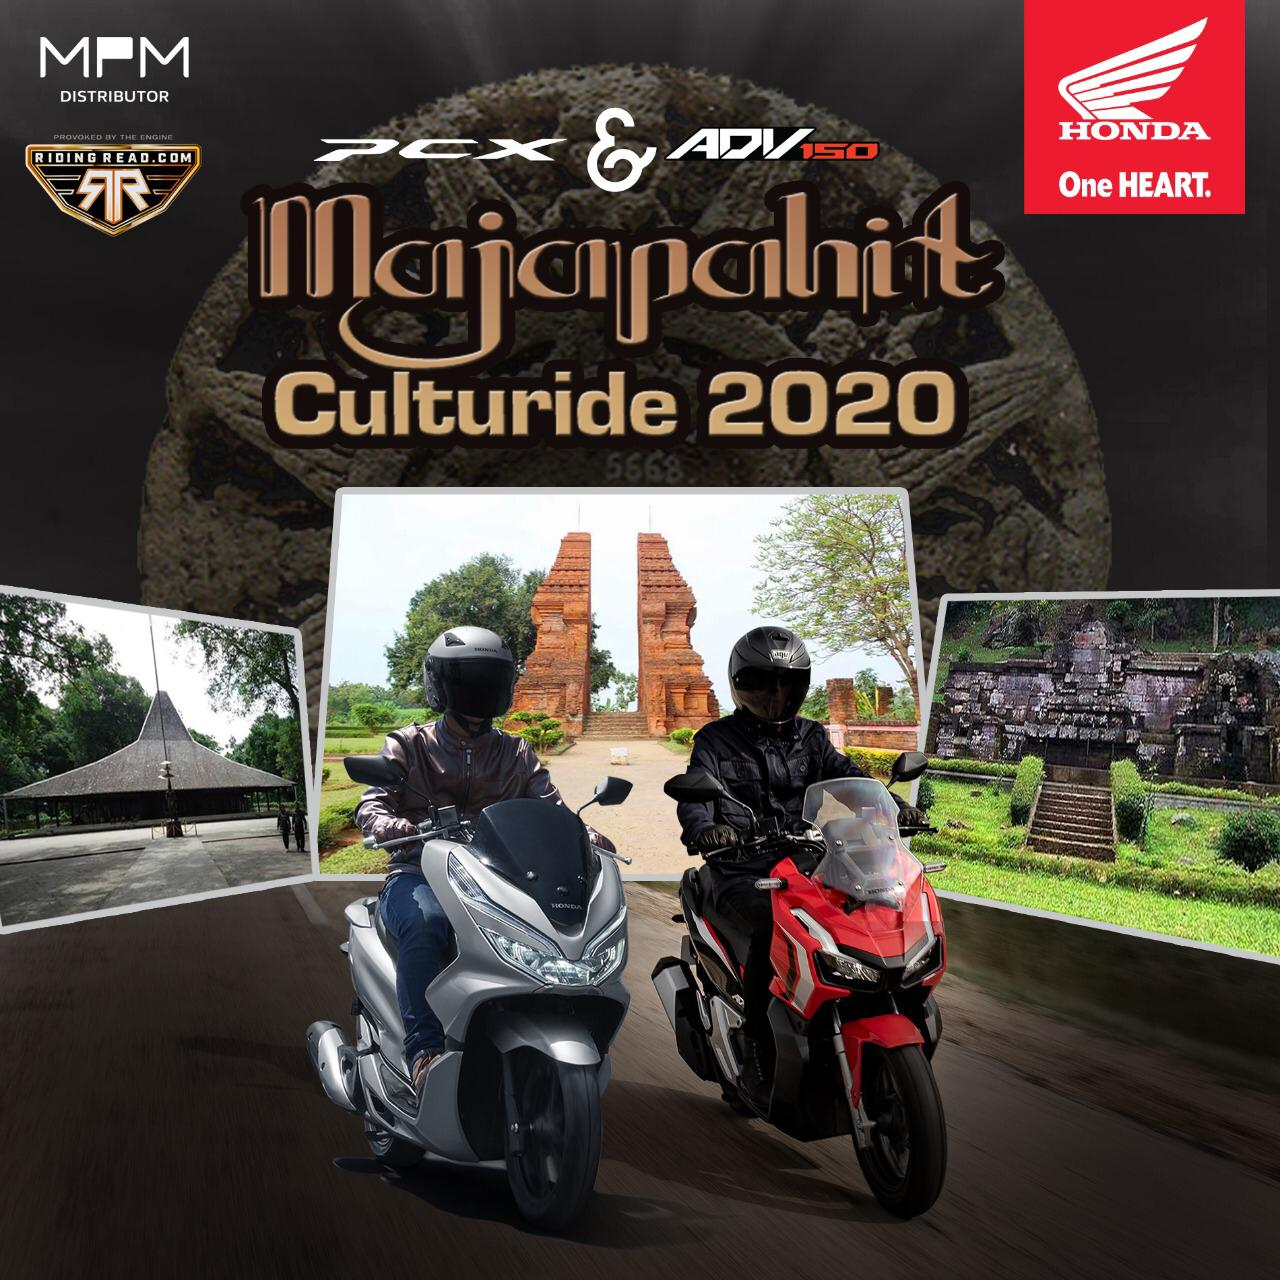 Honda ADV150-PCX  Majapahit Culturide 2020 PART 1…NIKMATI  ROMANTISME ALAM JAWA TIMUR DAN SITUS PENINGGALAN KERAJAAN MAJAPAHIT By Isfandiari Md